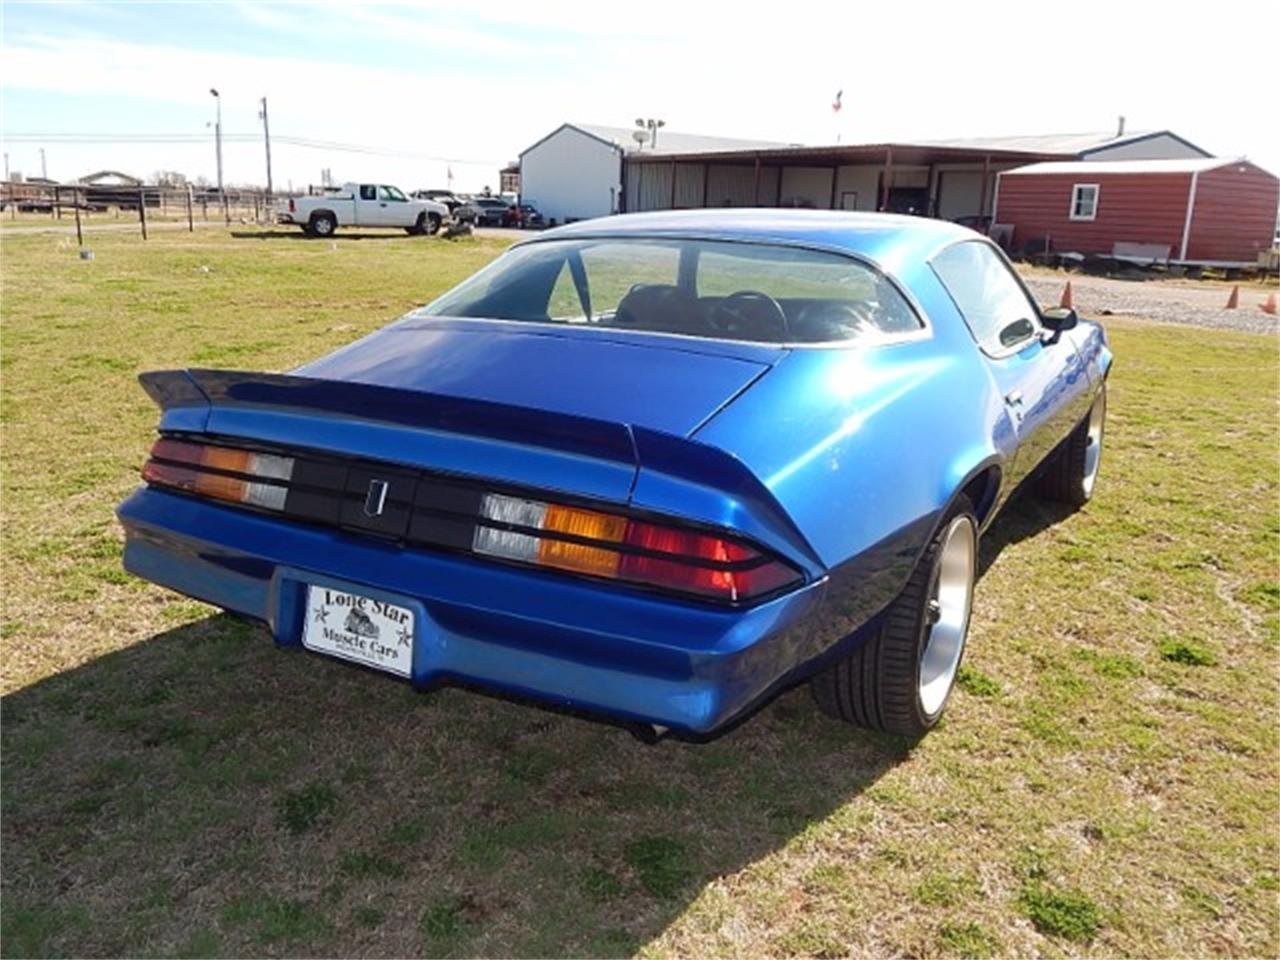 Large Picture of 1979 Camaro located in Wichita Falls Texas - $19,900.00 - L8KU